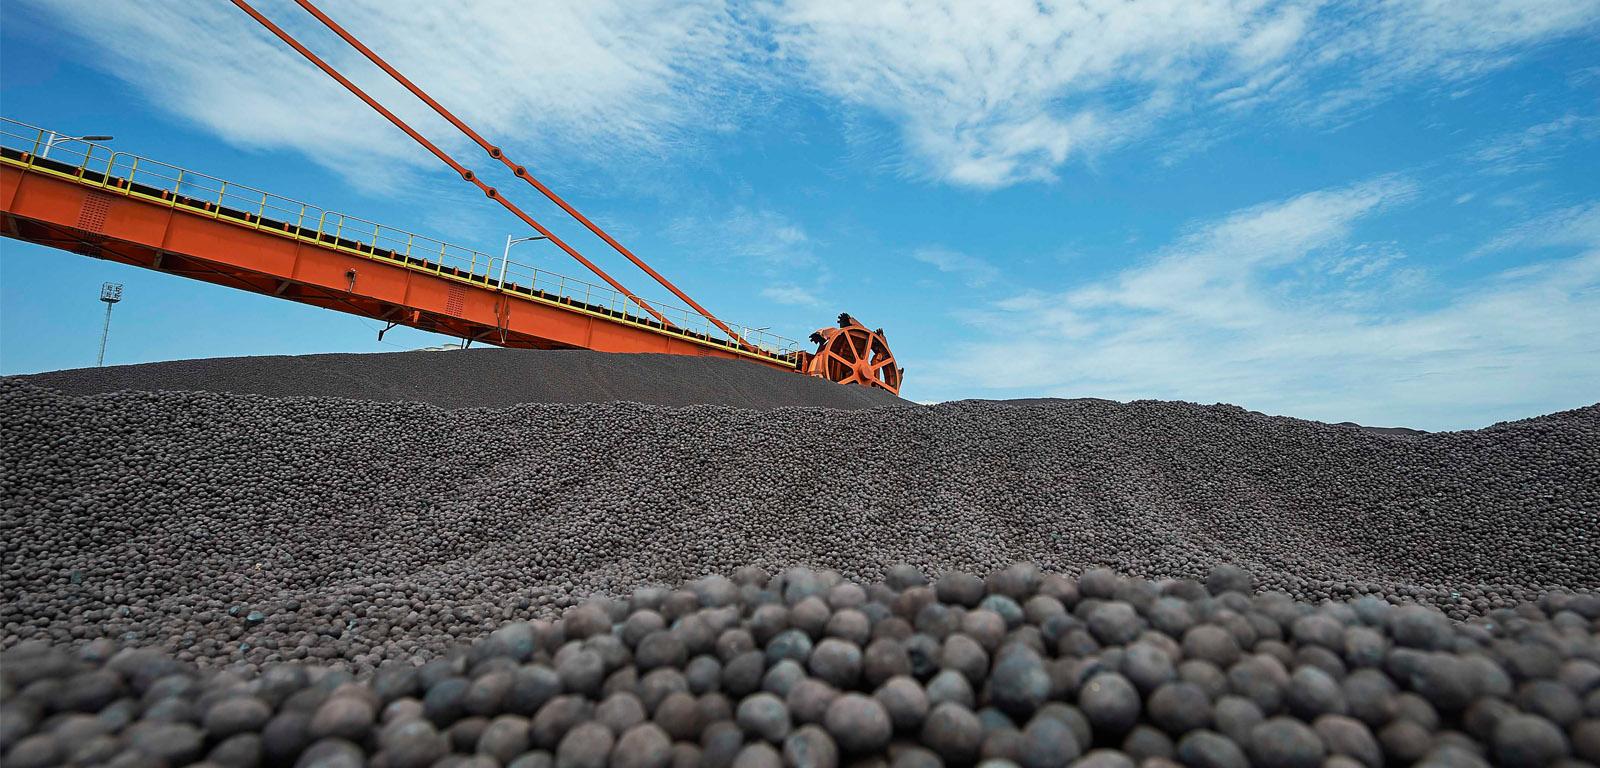 krakatau-steel-committed-to-restructuring-despite-lower-revenue